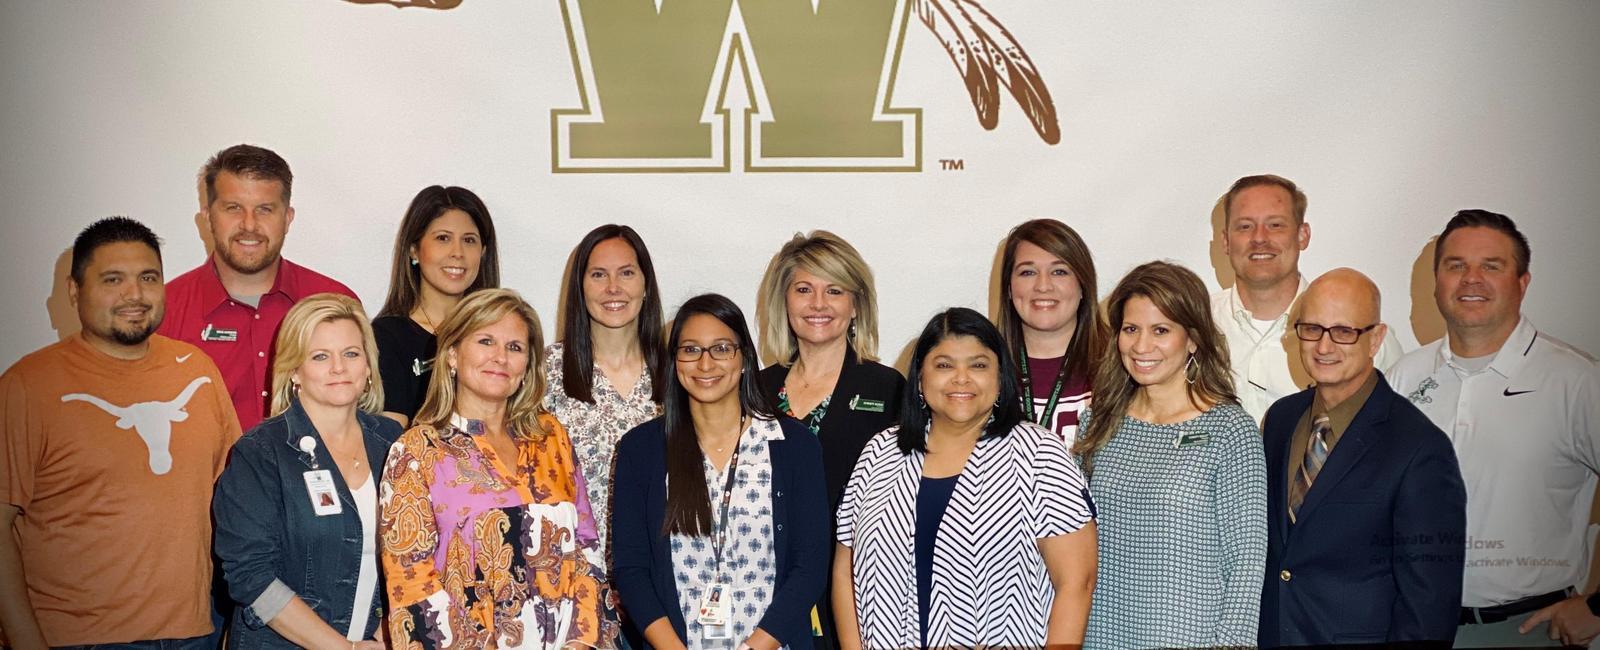 Waxahachie ISD Principals